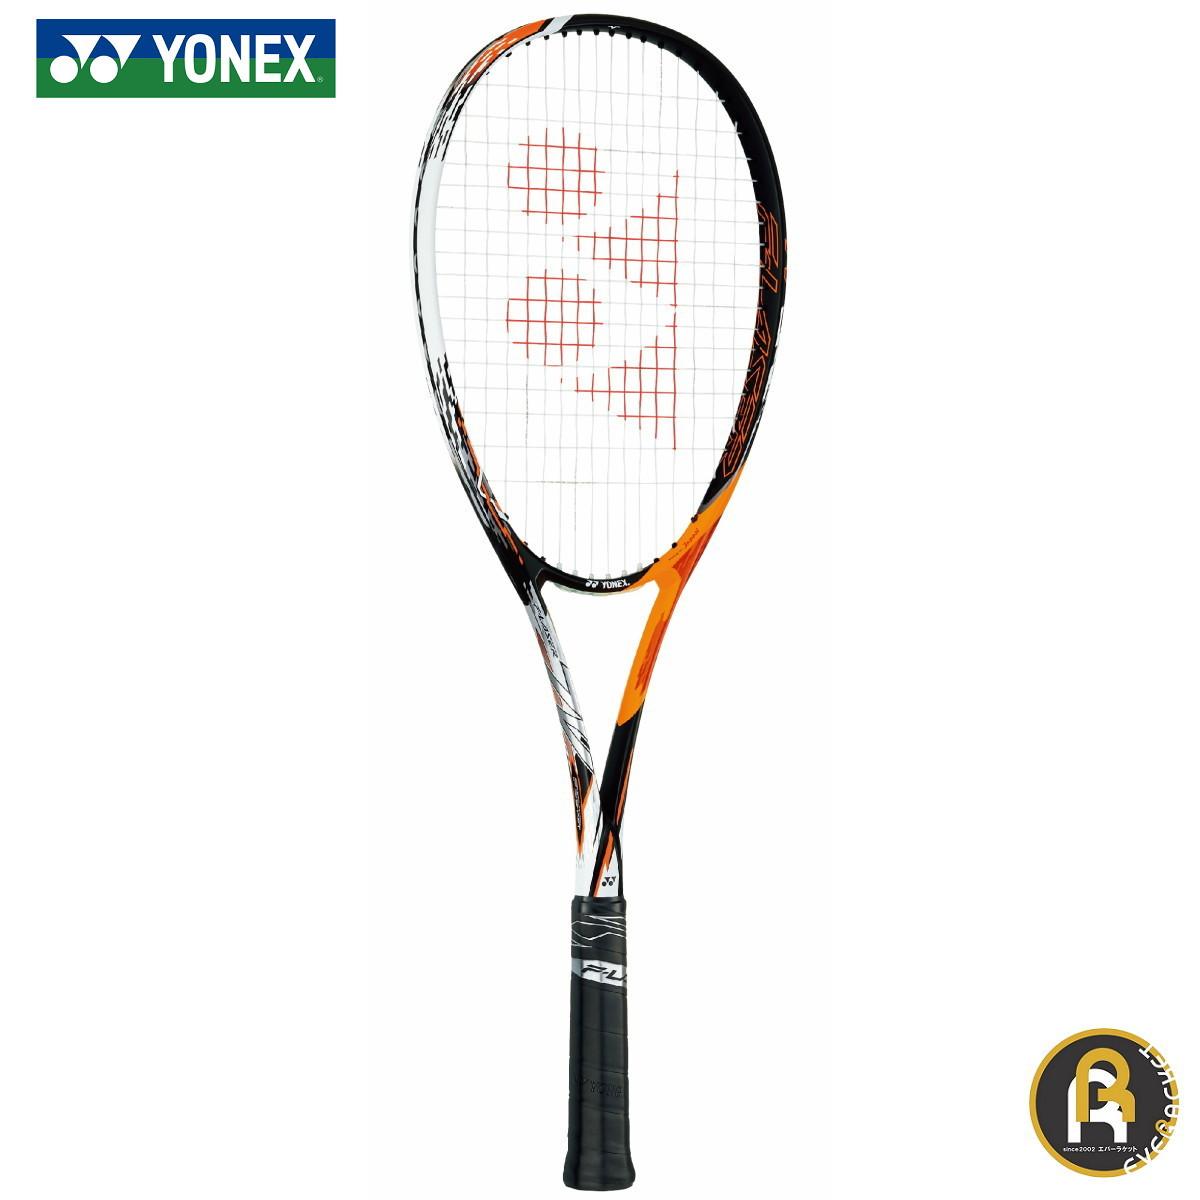 YONEX ヨネックス バドミントン ソフトテニスラケット エフレーザー7V FLR7V 《ガット代・張り代無料》《S張り:V張り対応》